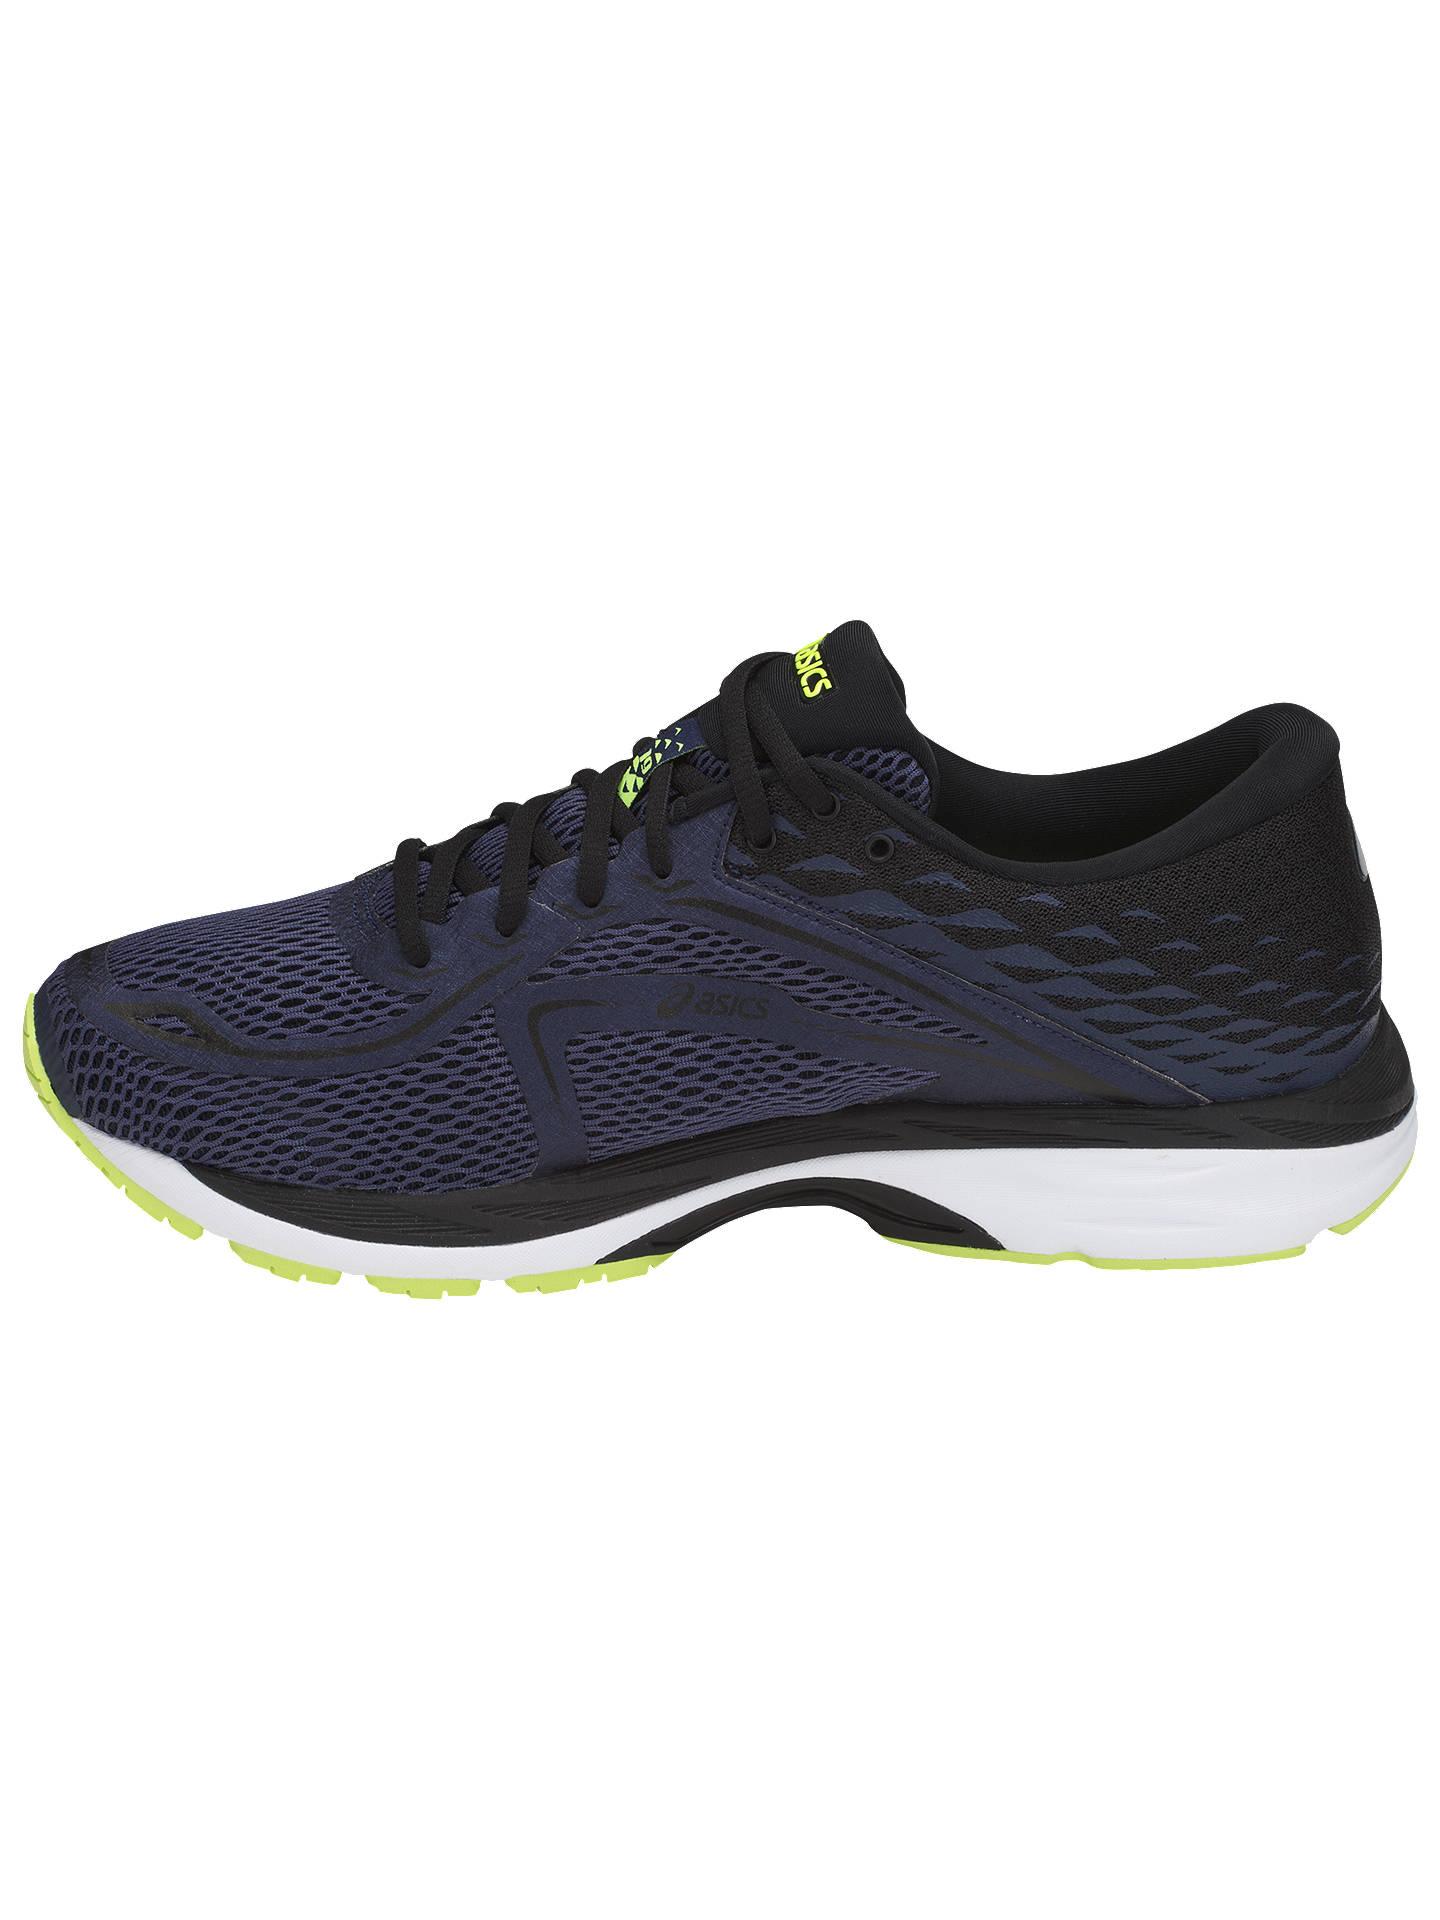 9db9f49a Asics GEL-CUMULUS 19 Men's Running Shoes, Black/Indigo Blue/Safety ...